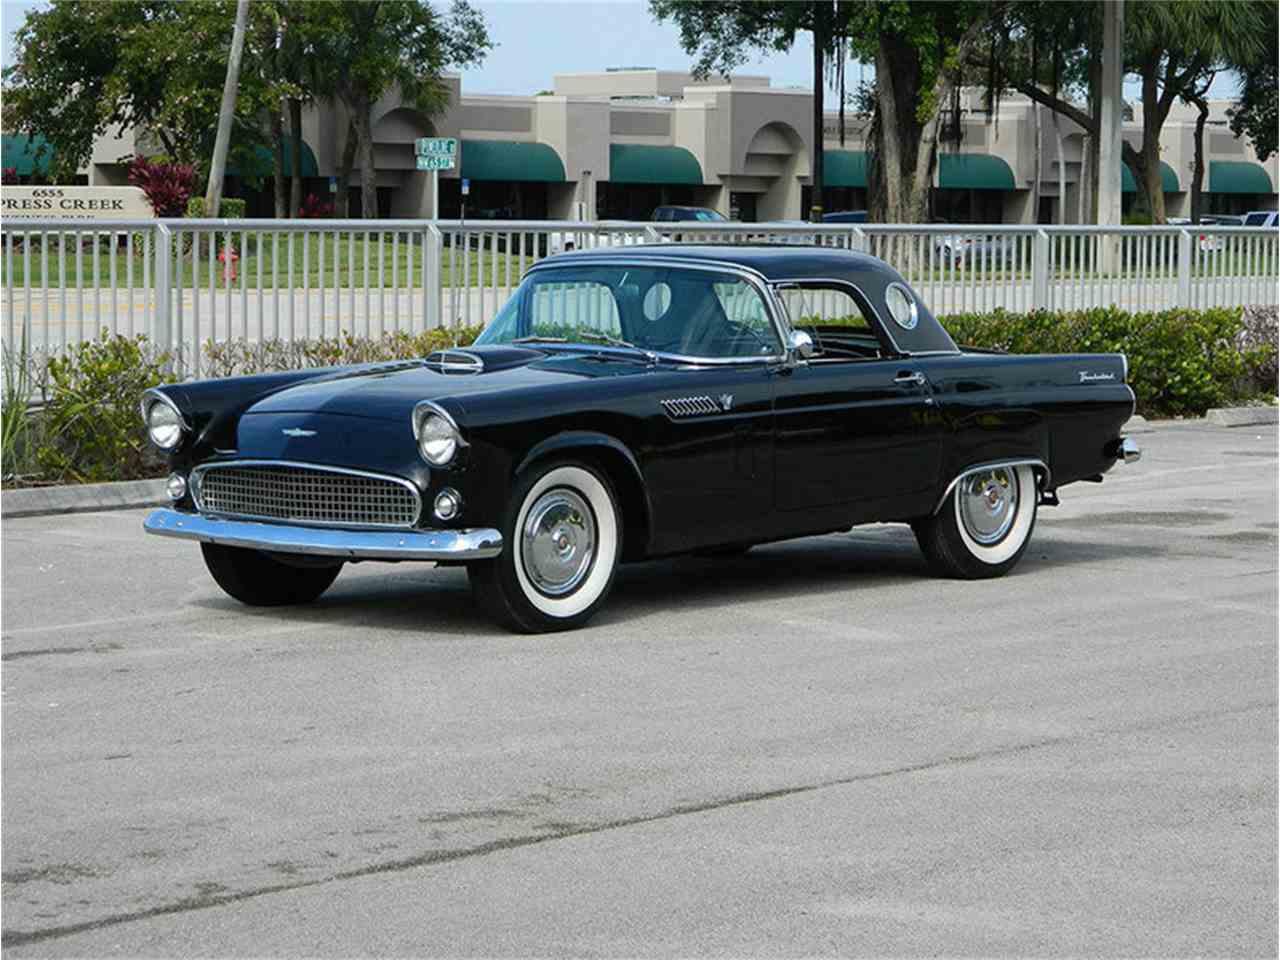 1956 Ford Thunderbird For Sale Classiccars Com Cc 956786